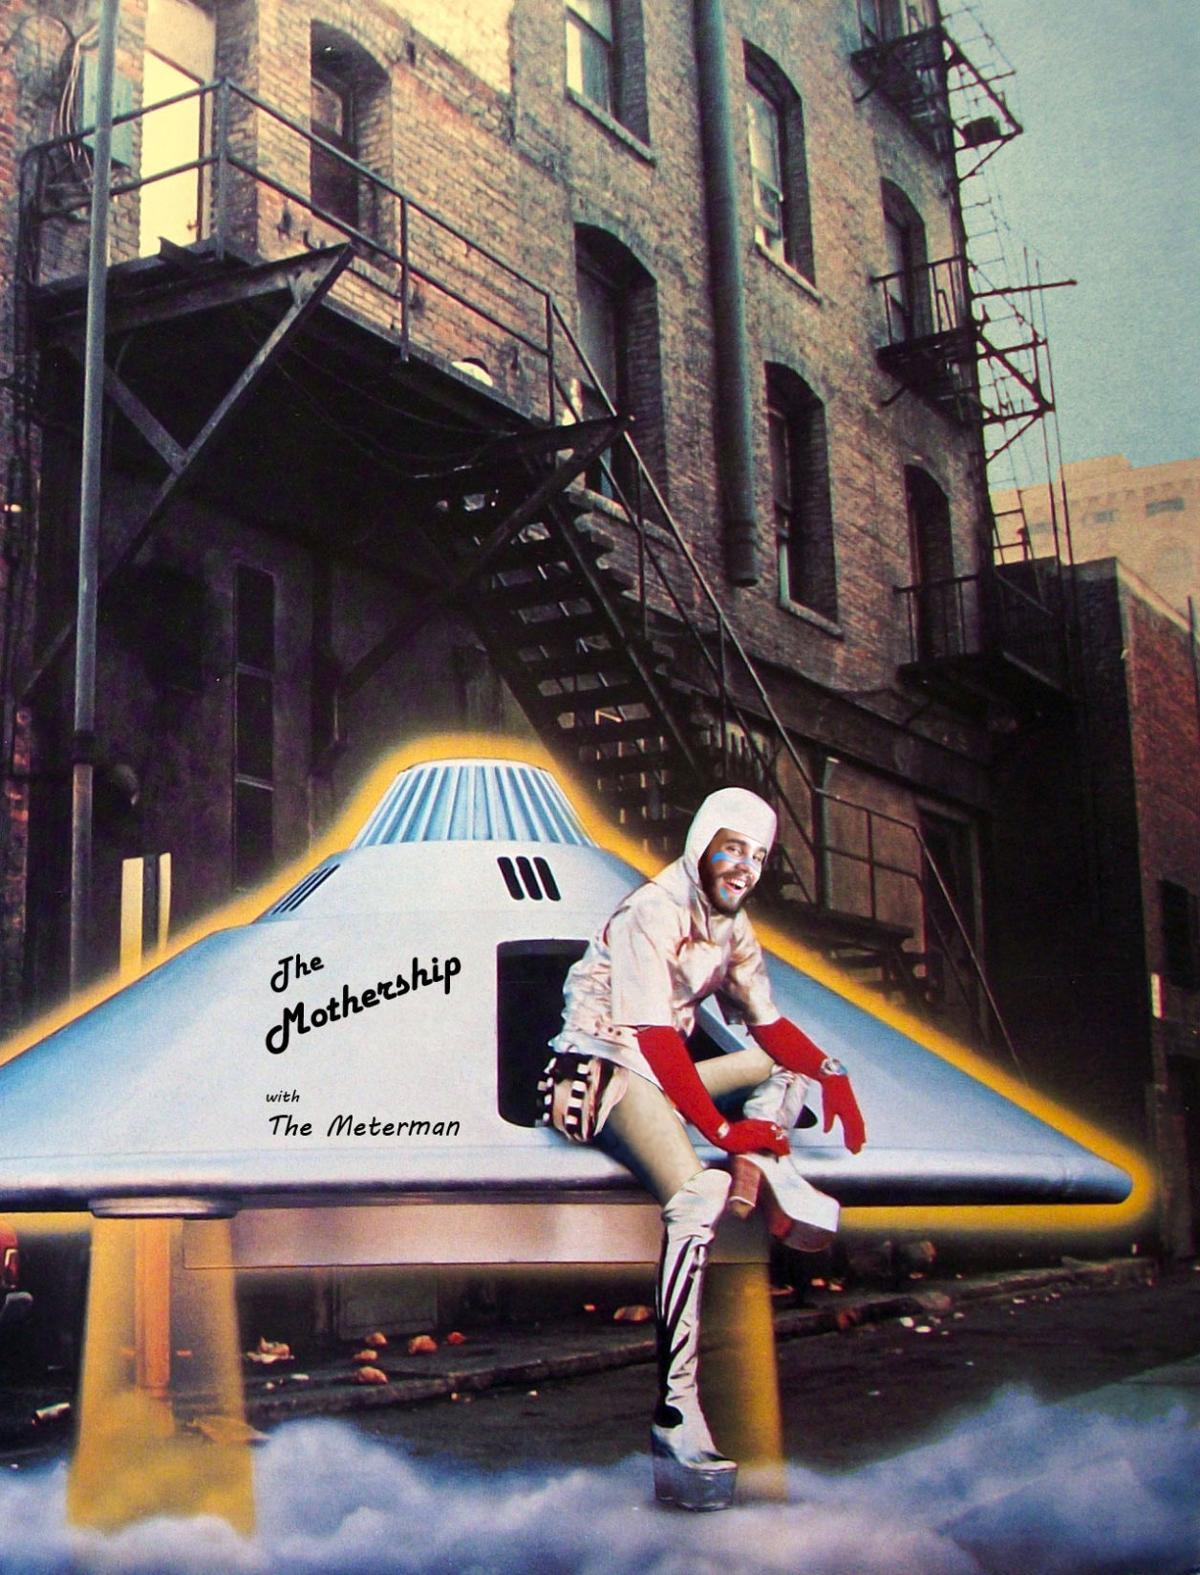 The Meterman